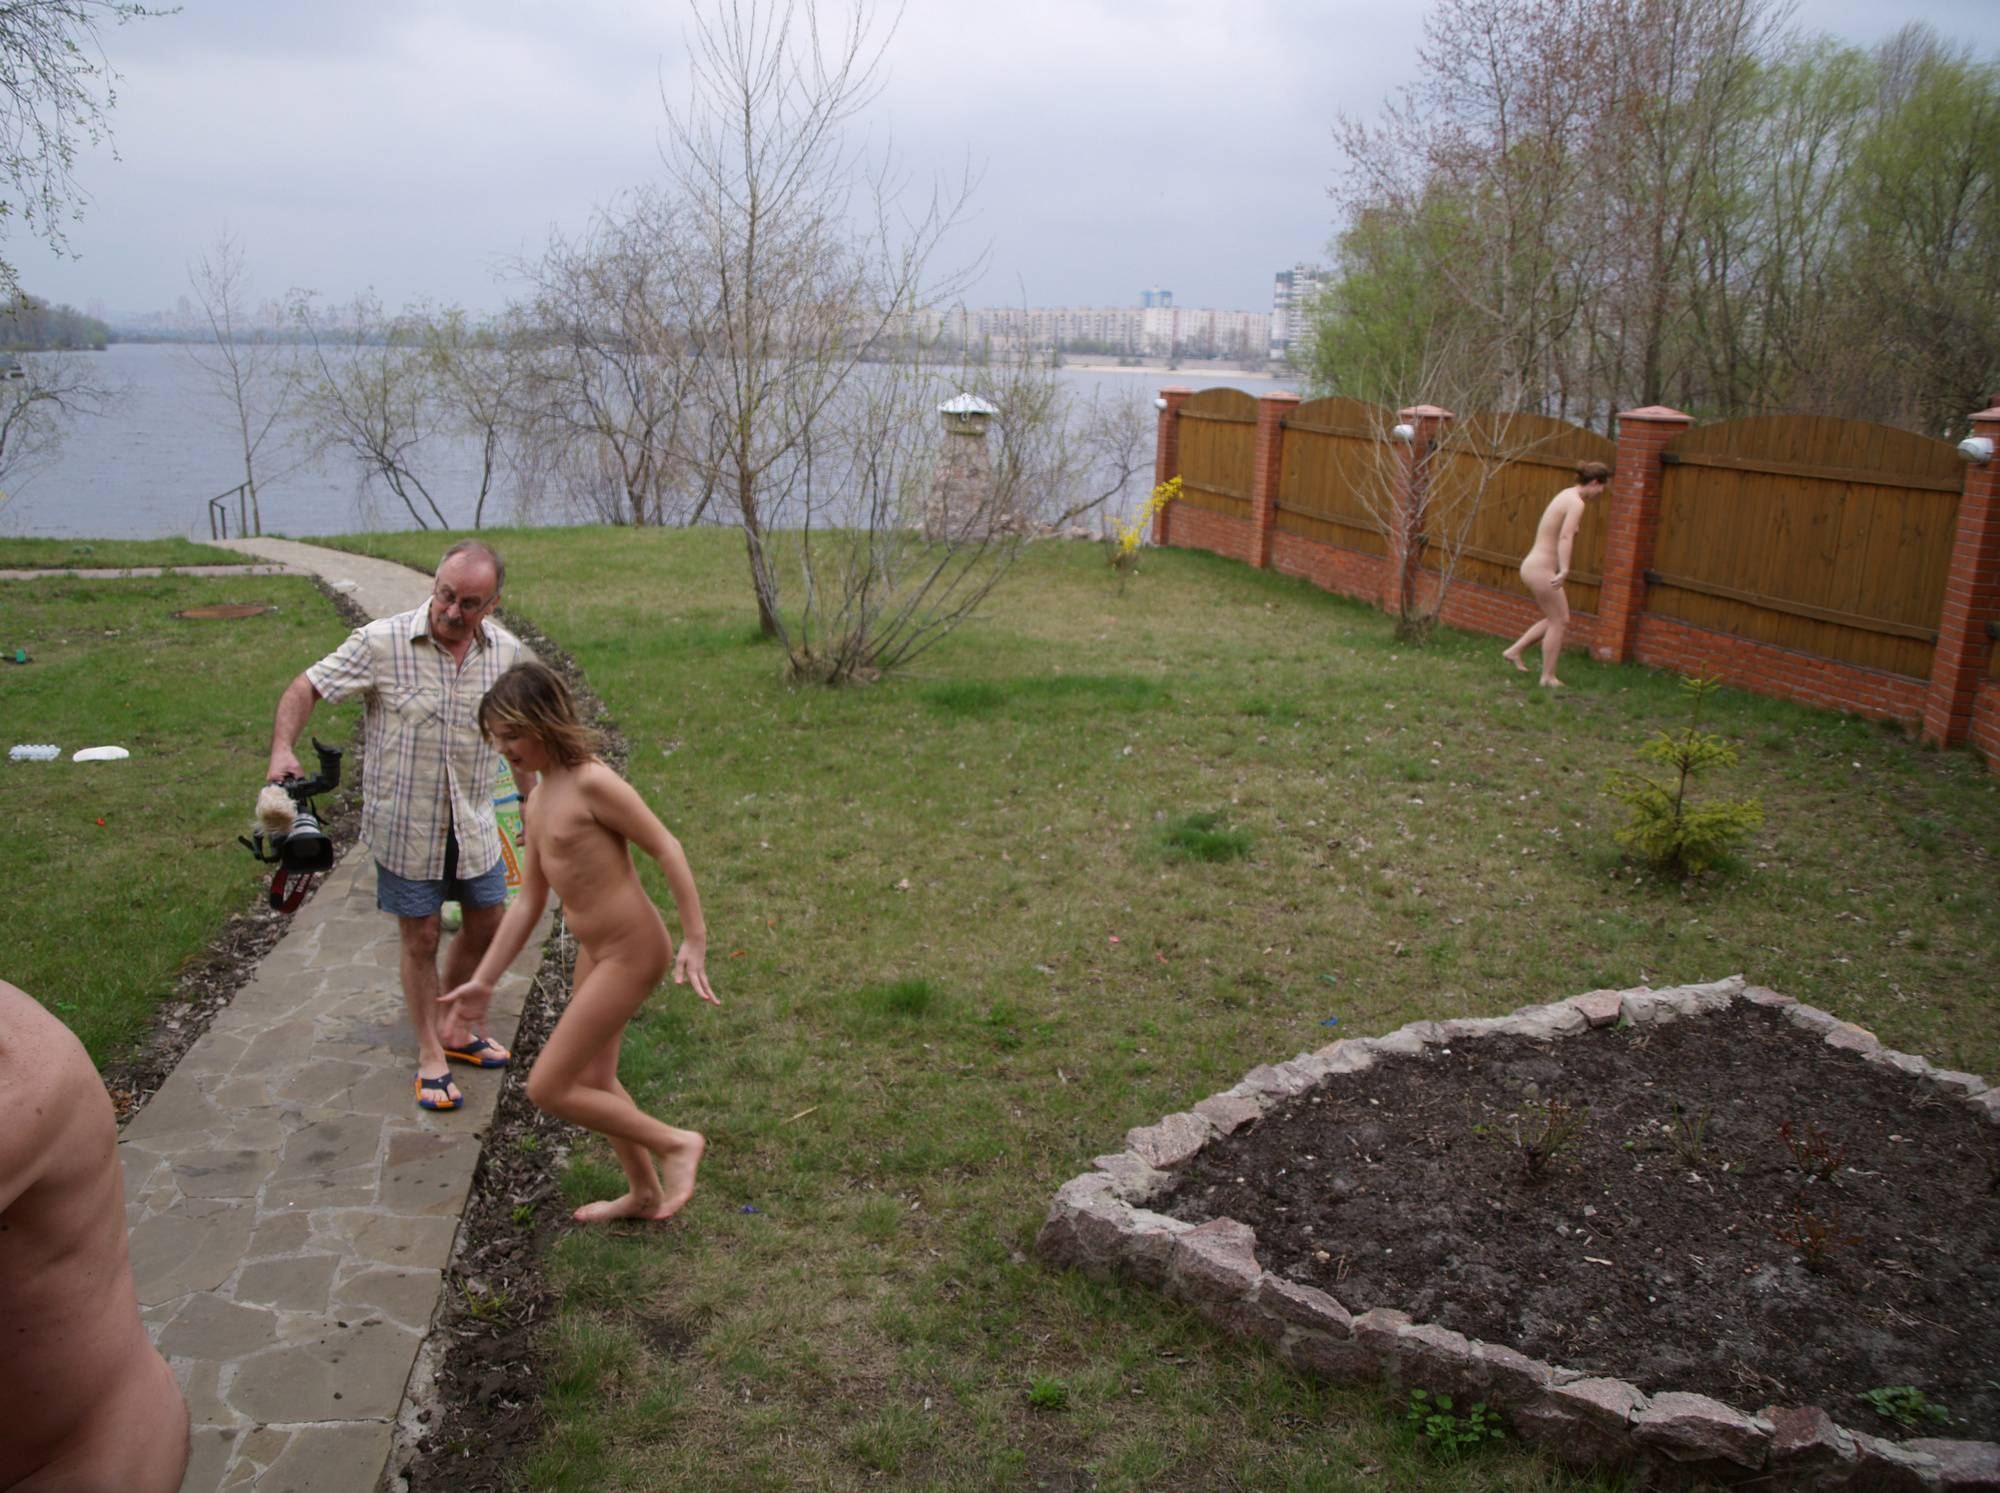 Nudist Pics Easter Egg Preparations - 2